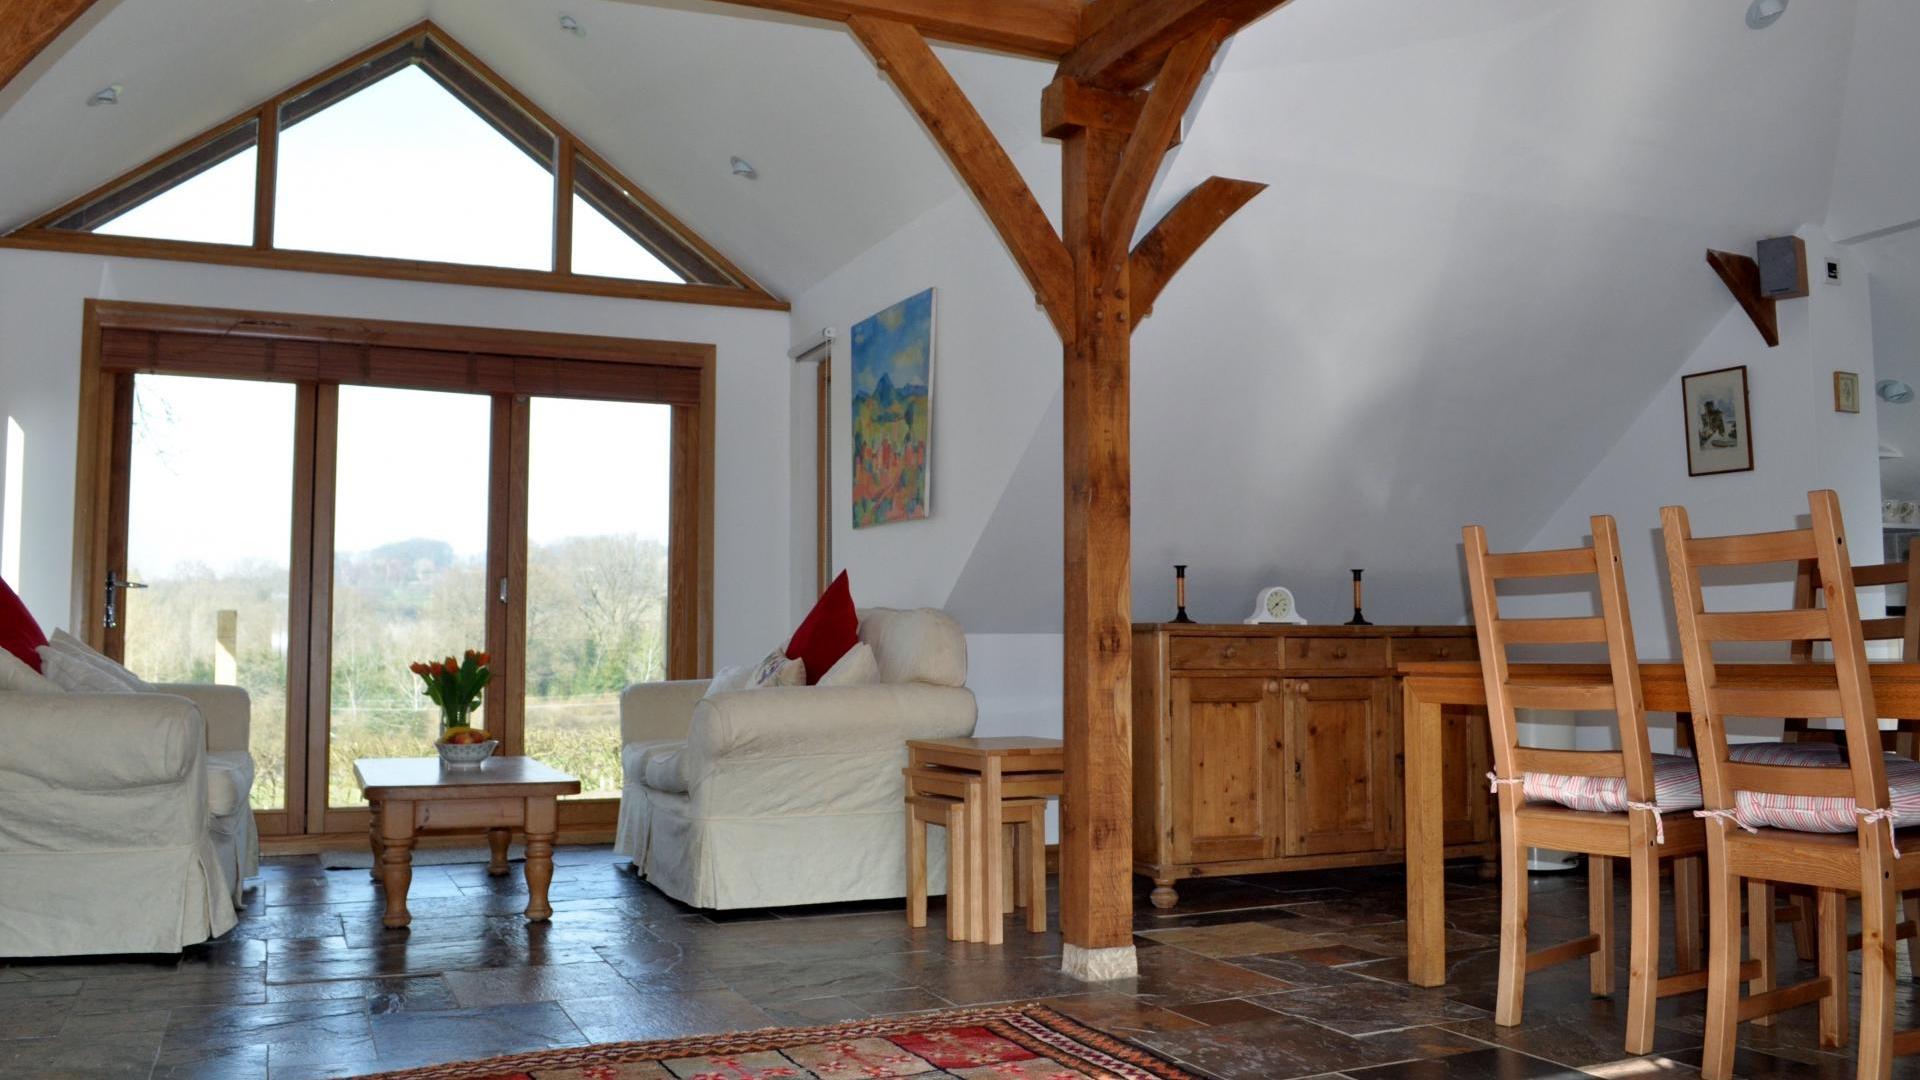 1 Bedroom Private cottage in Kent, United Kingdom